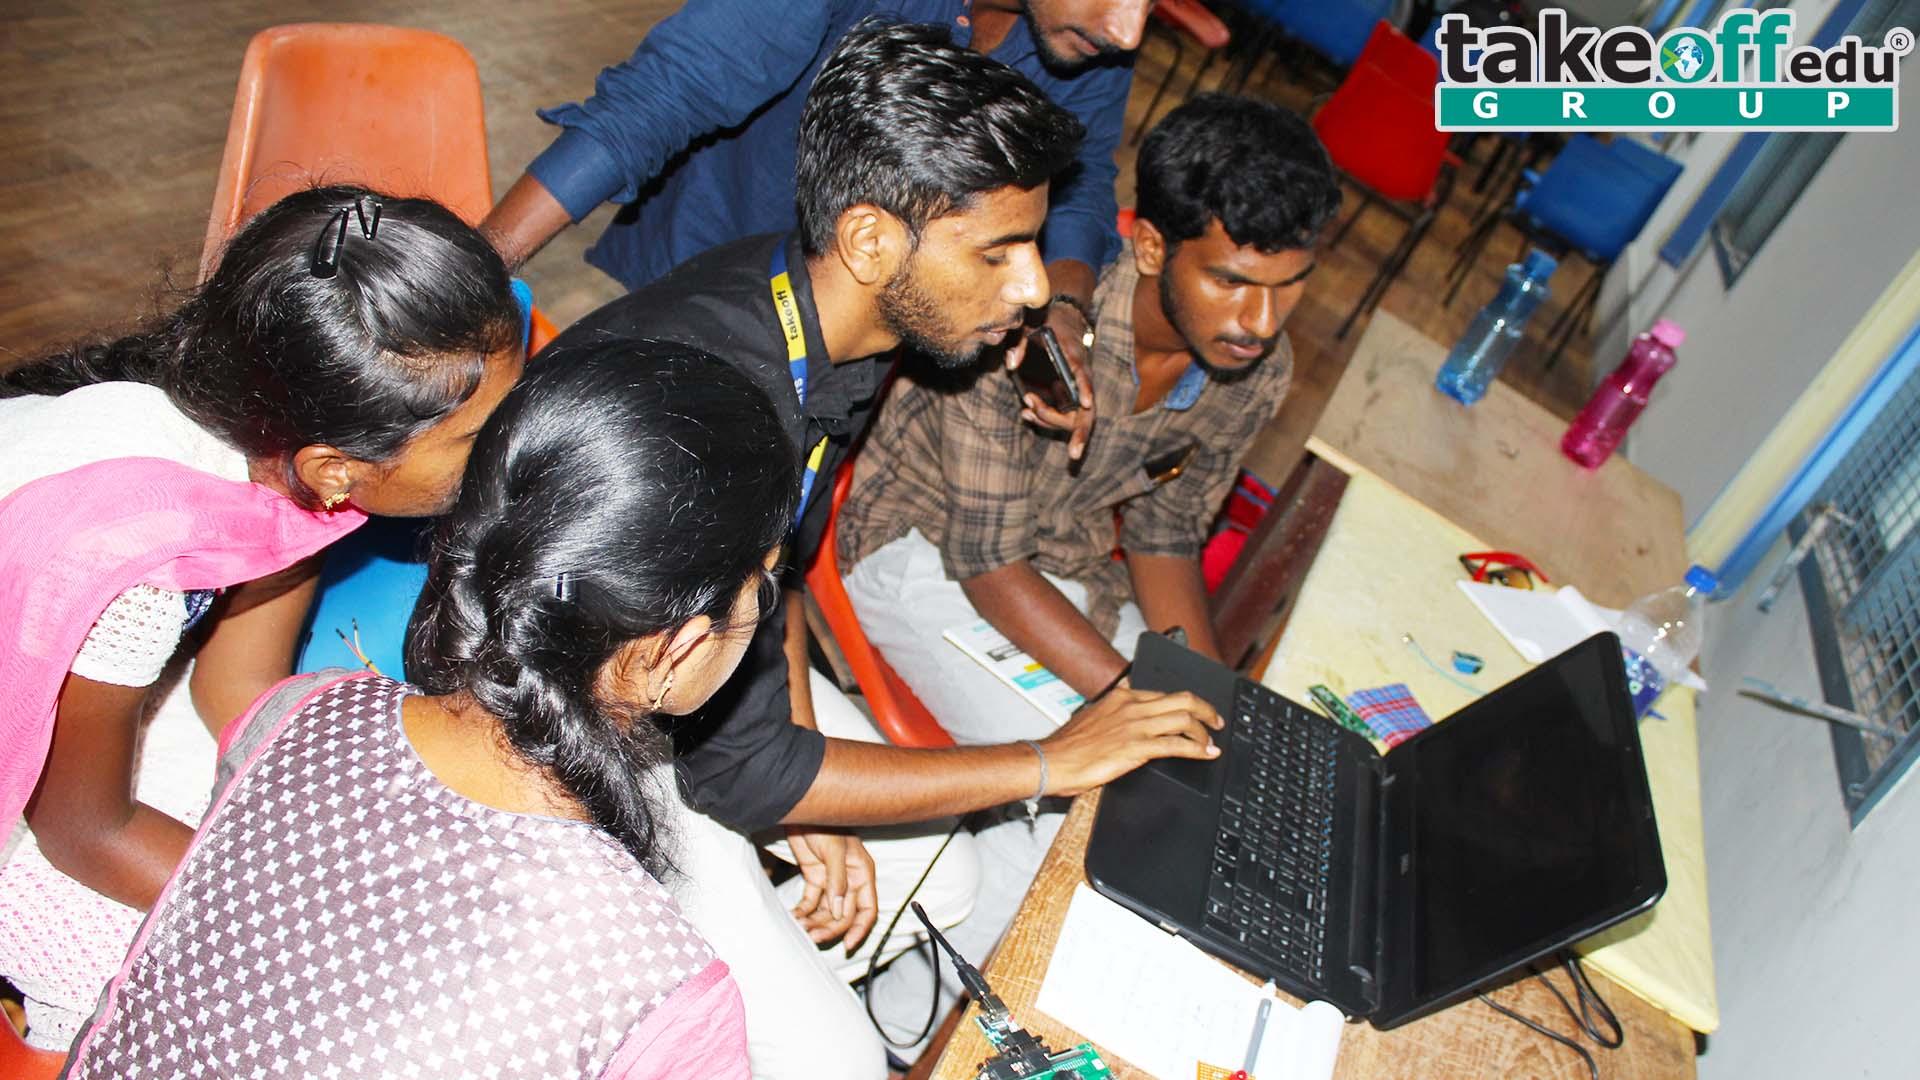 SVU - Sri Venkateswara University, Tirupati , ARM7